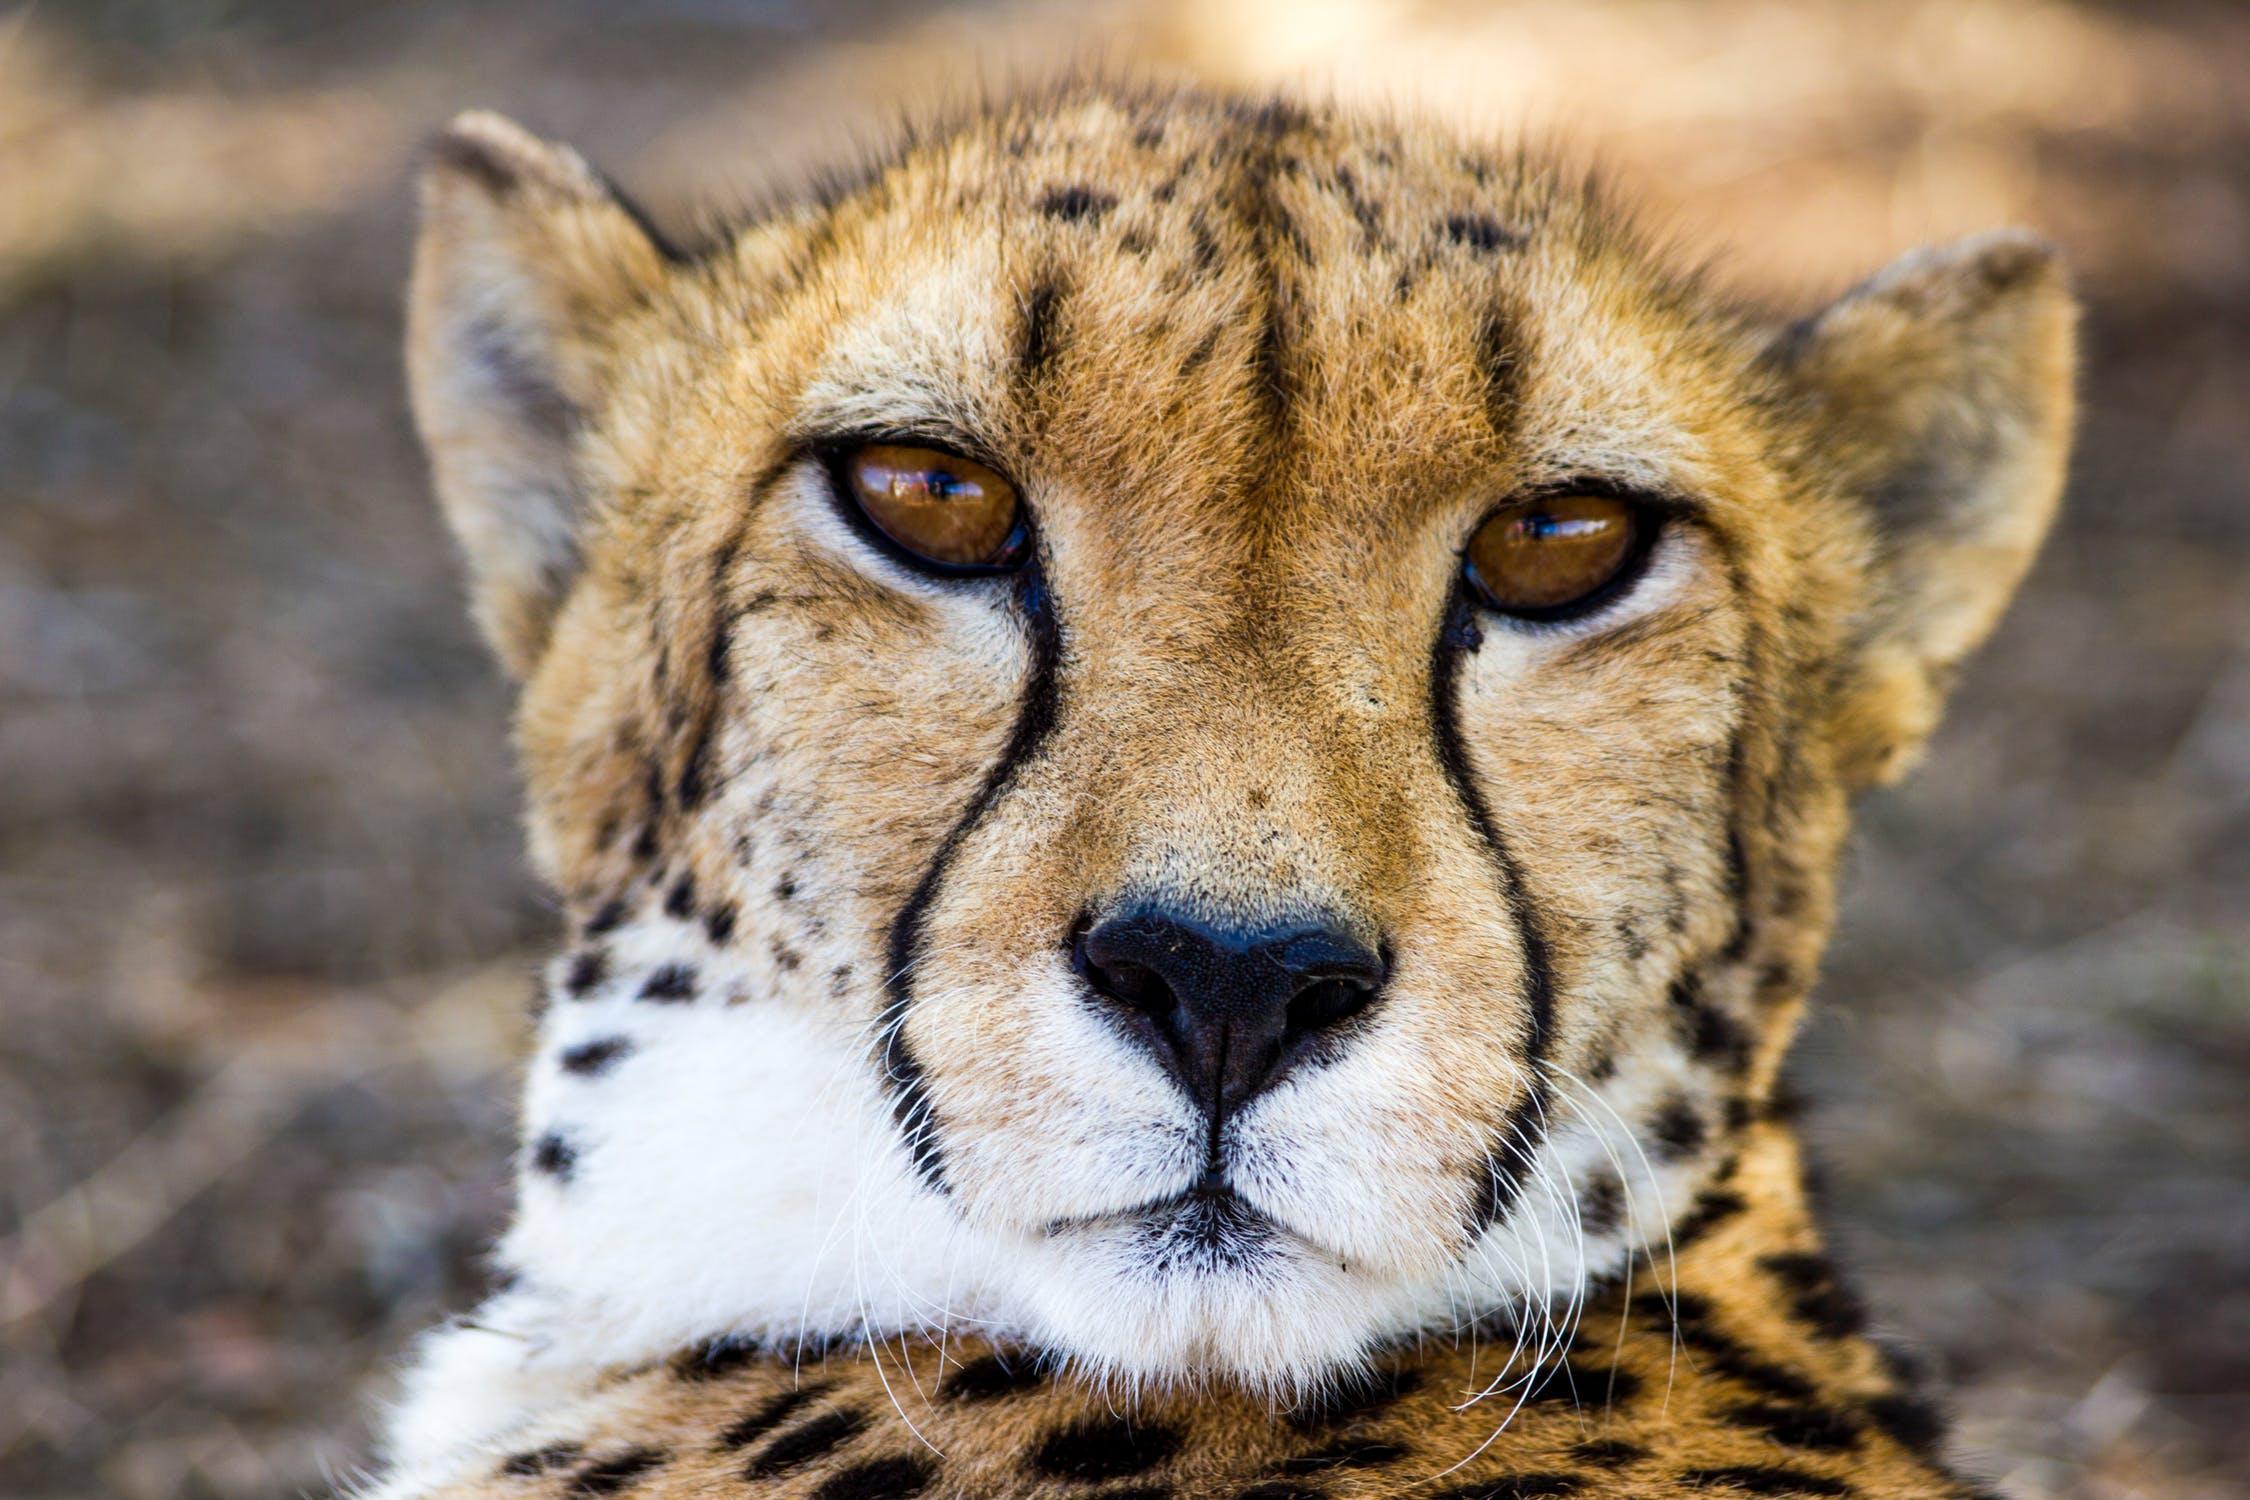 cheetah, Travel Africa, Africa Safari Guide, Luxury African Safari